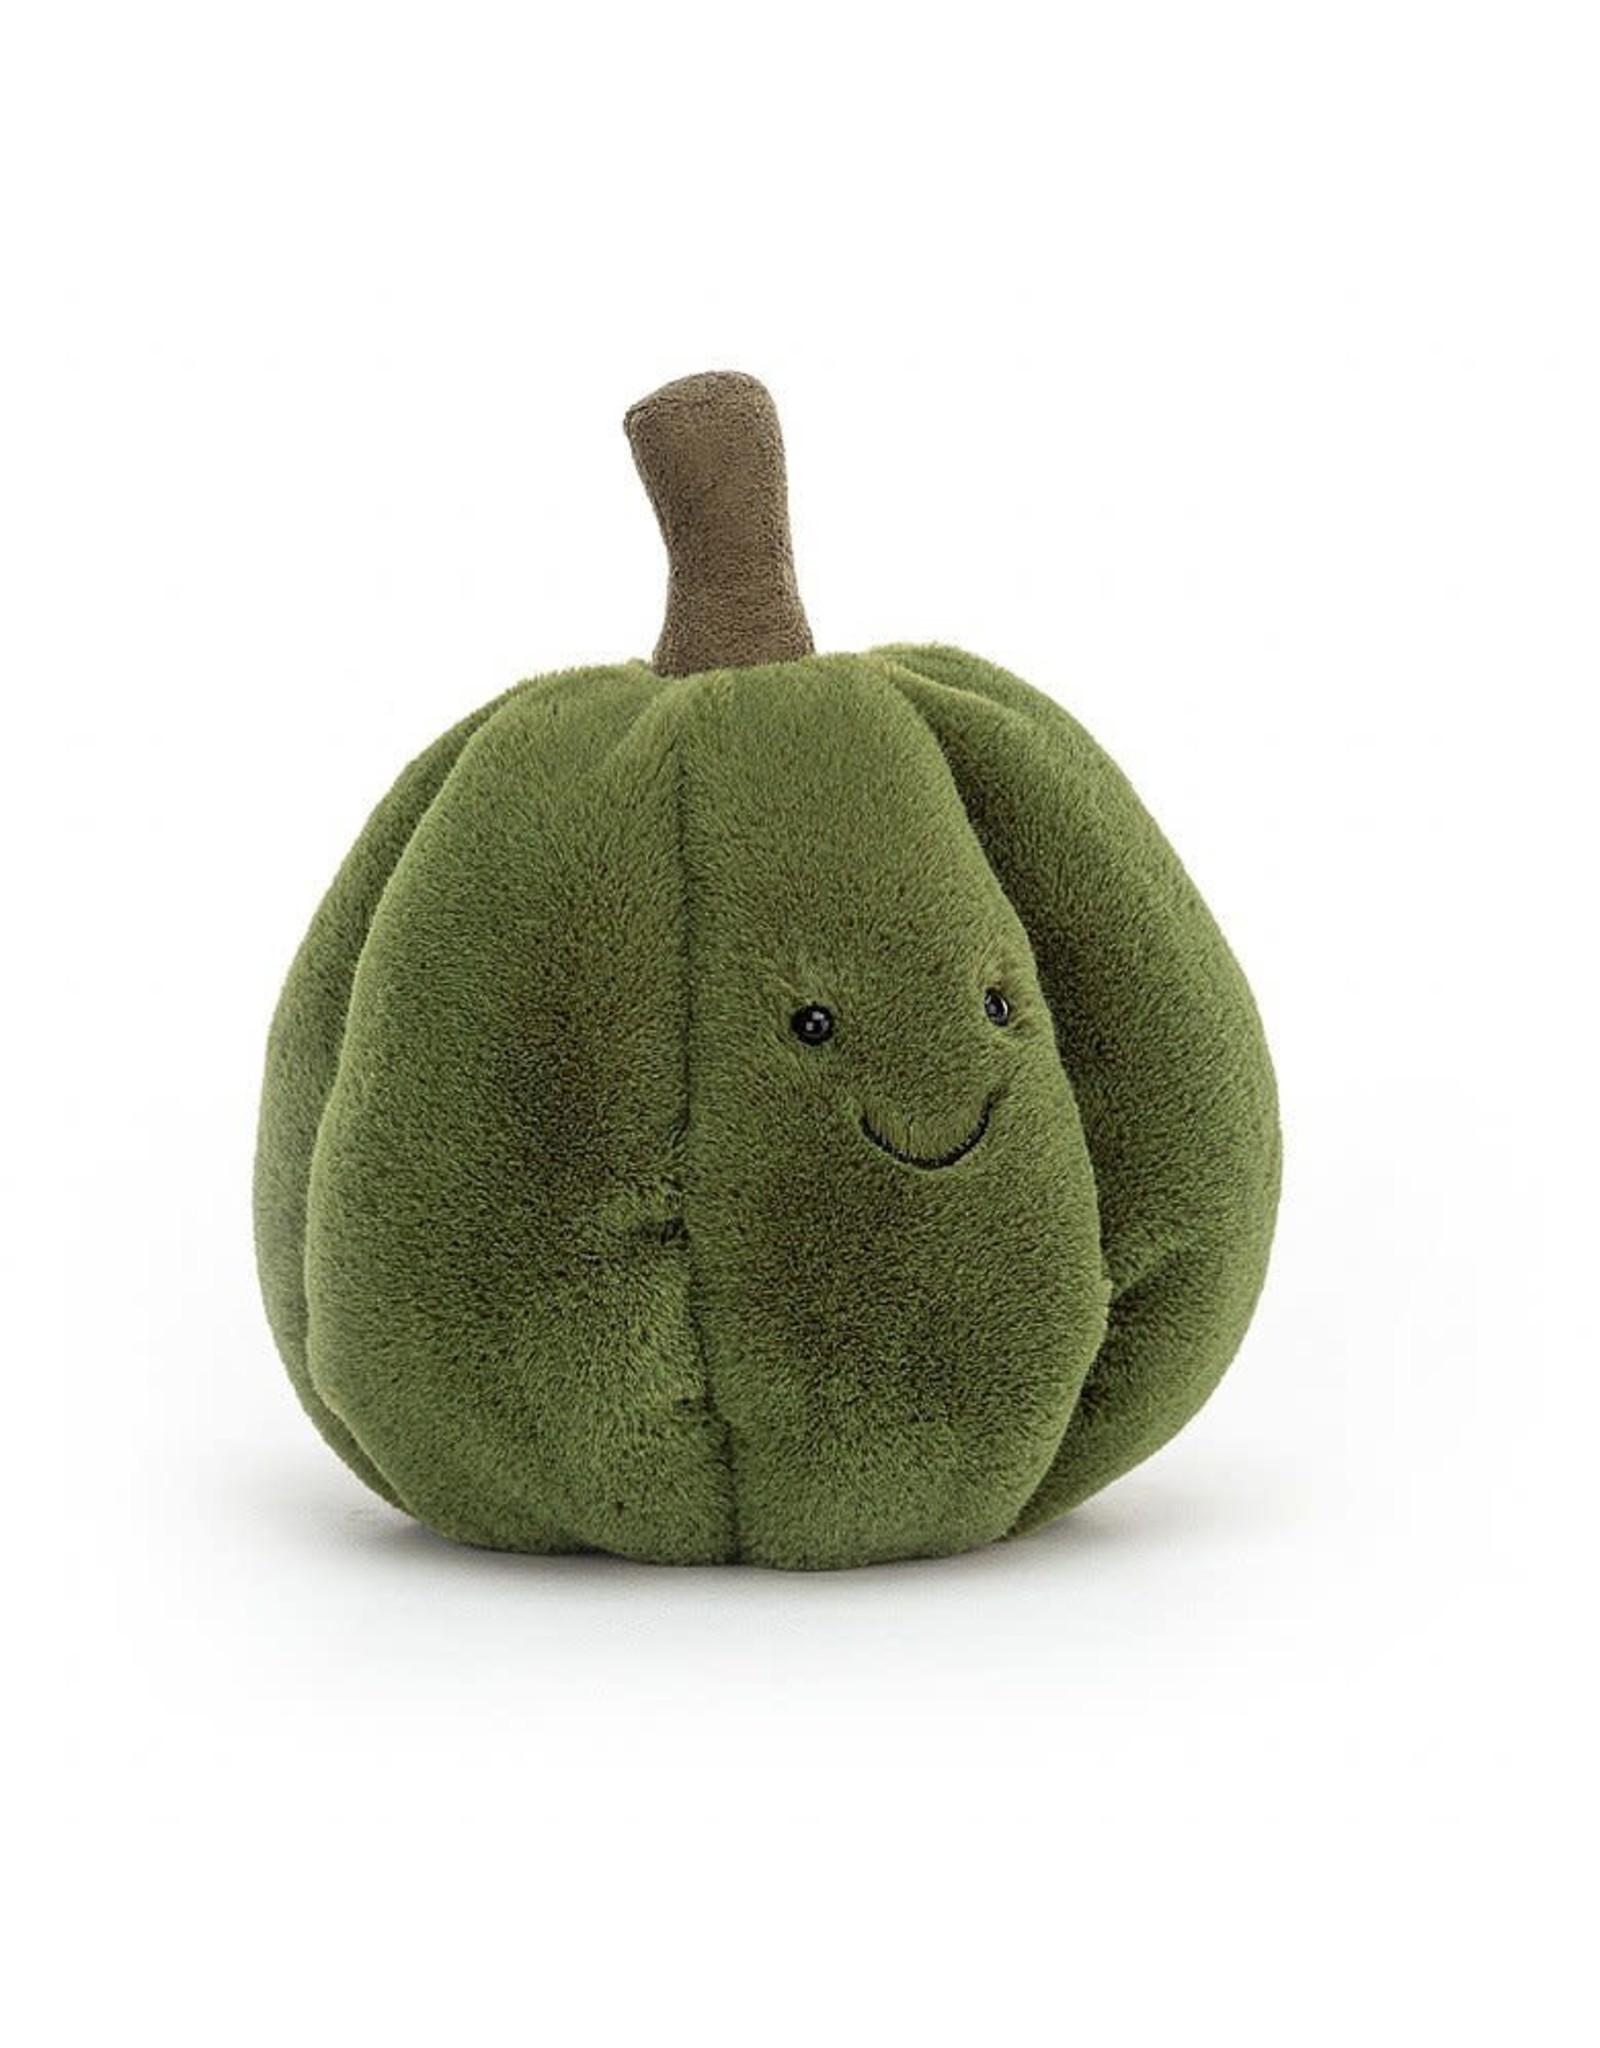 Jellycat JellyCat Squishy Squash Green